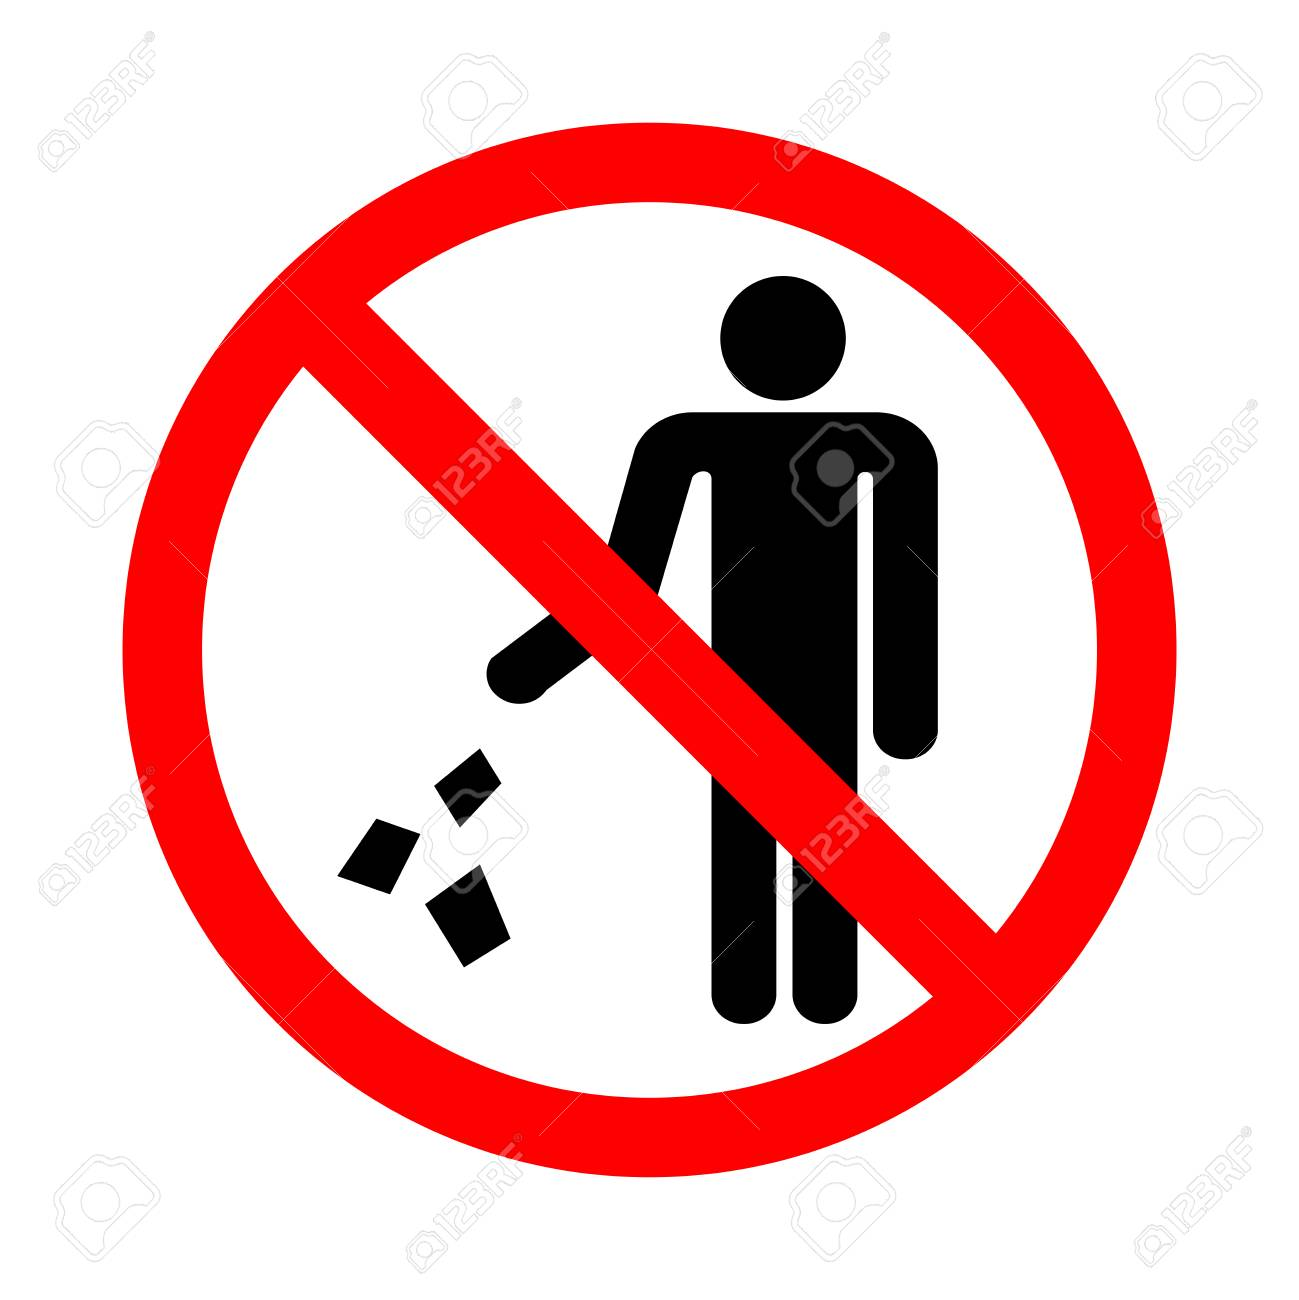 Do not litter sign. Vector illustration on a white background. - 94916347